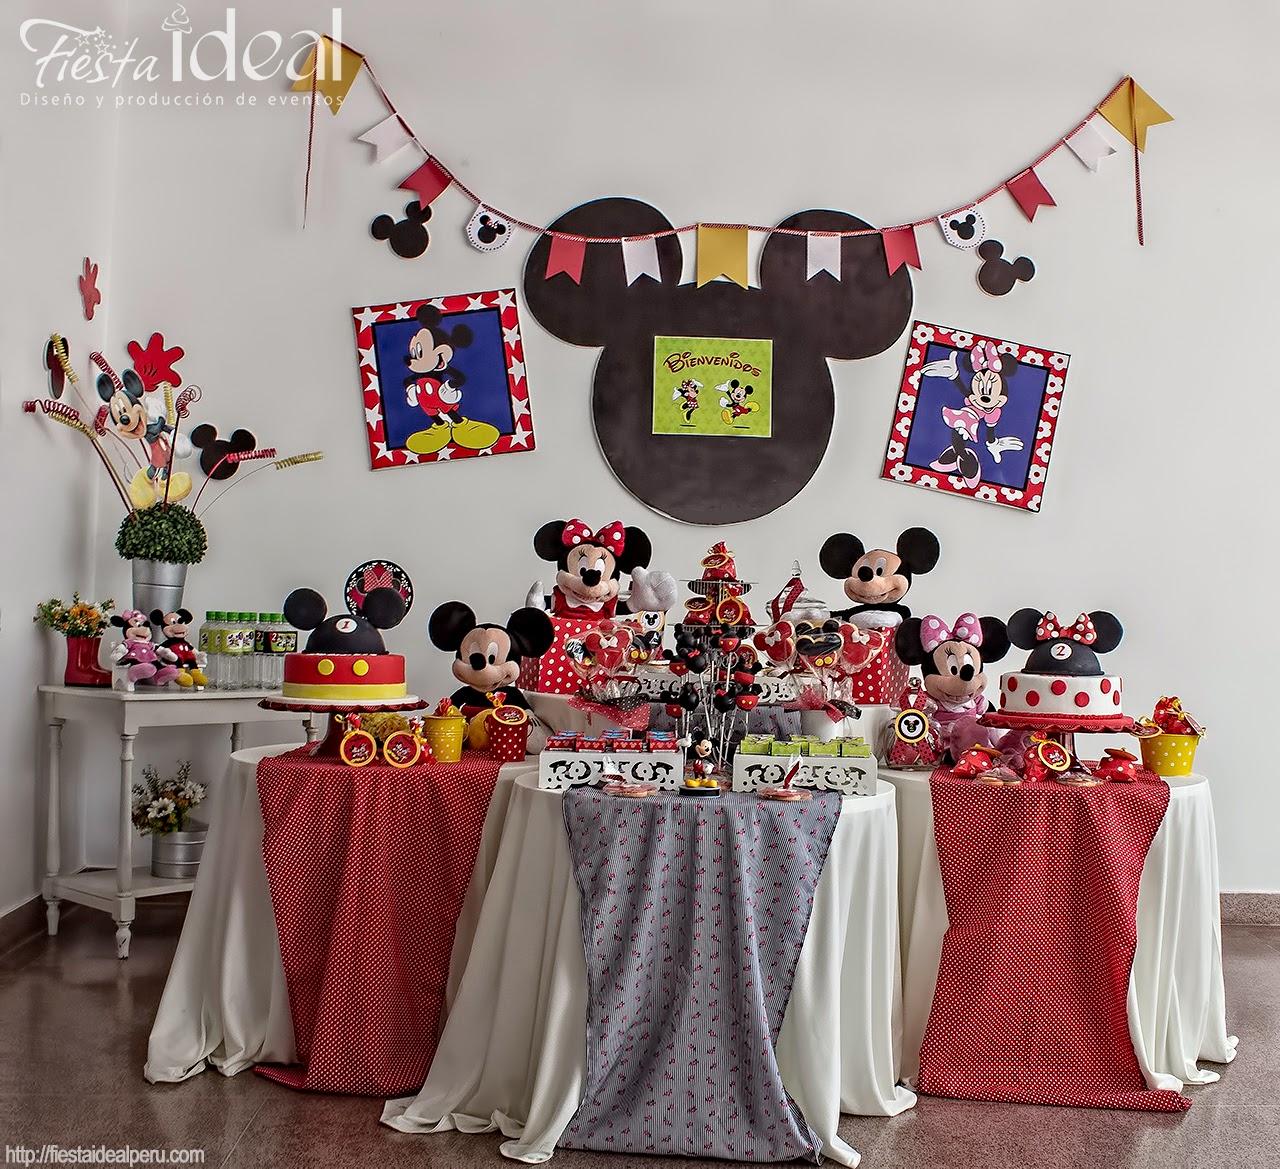 Fiesta ideal peru decoraci n fiesta cumplea os mickey y - Decoracion fiestas cumpleanos ...